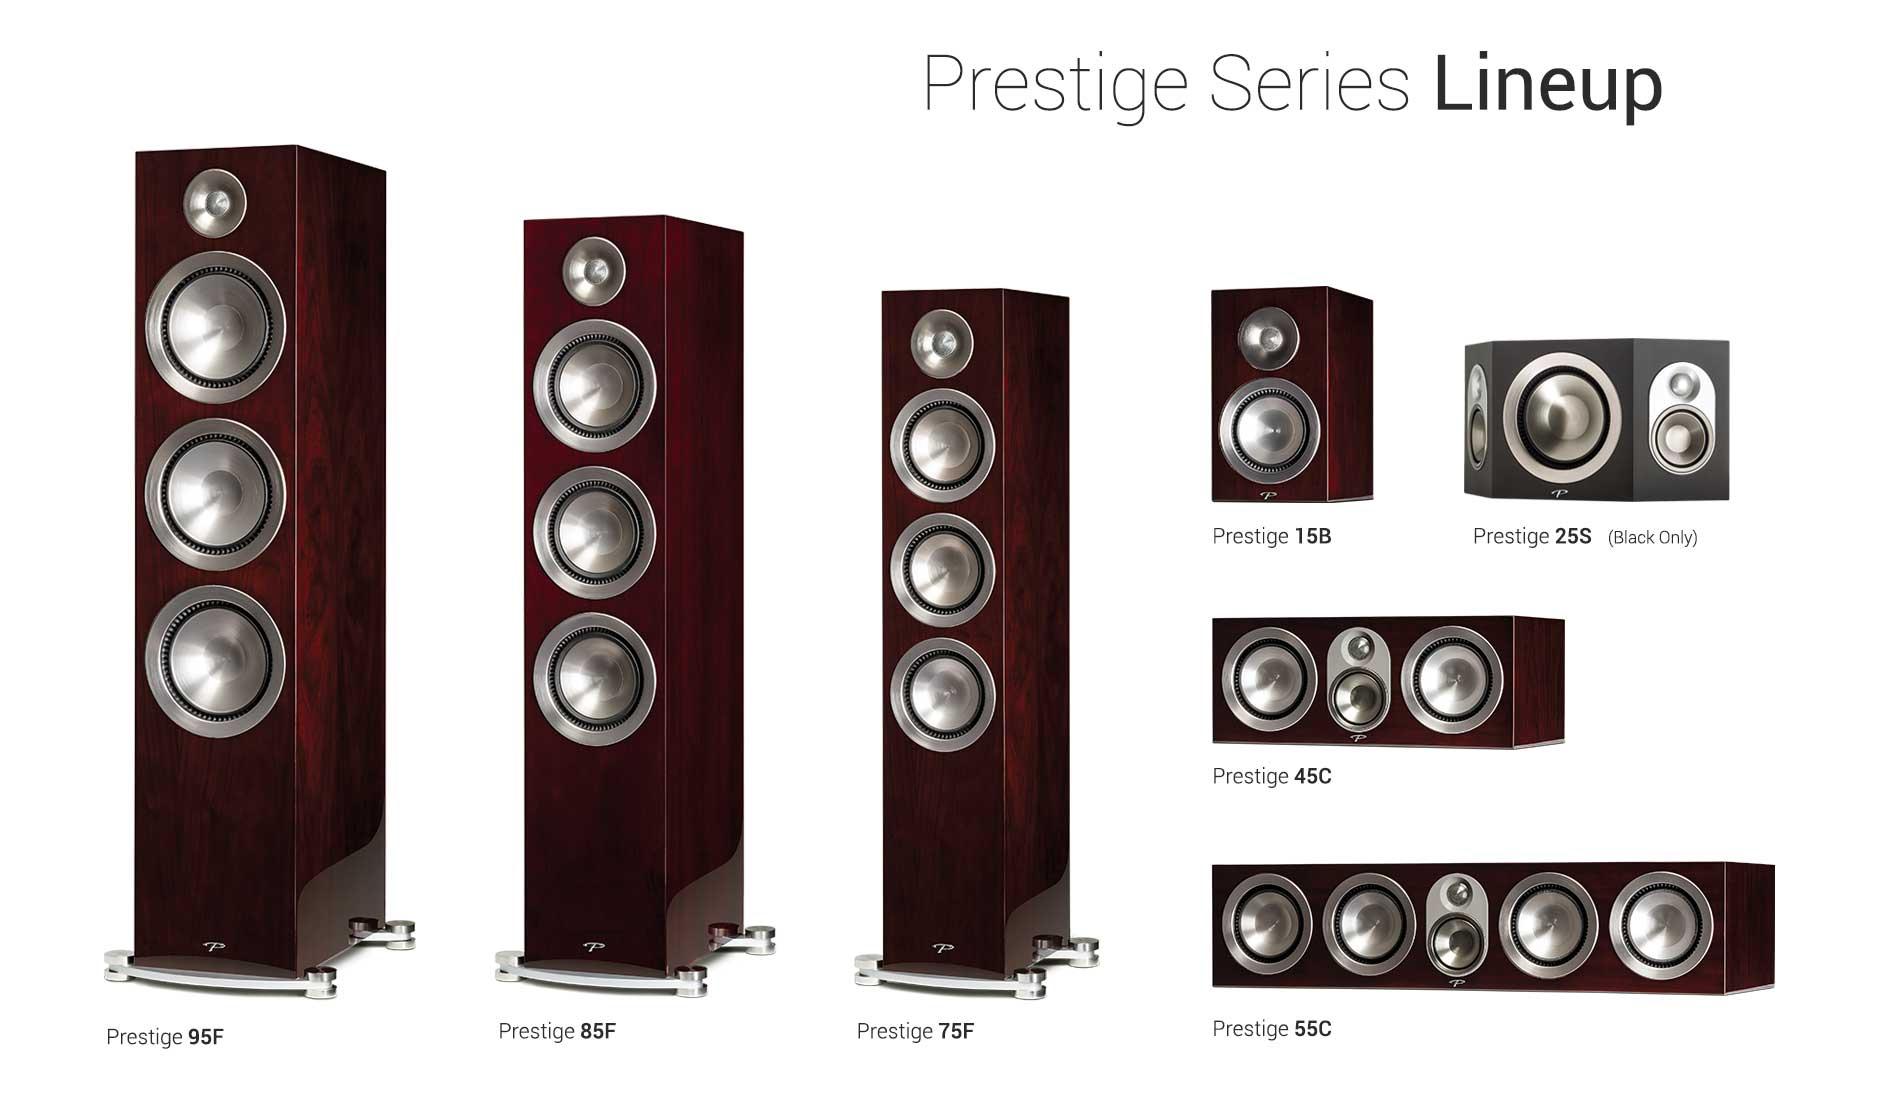 Paradigm Prestige Series Lineup Midnight Cherry